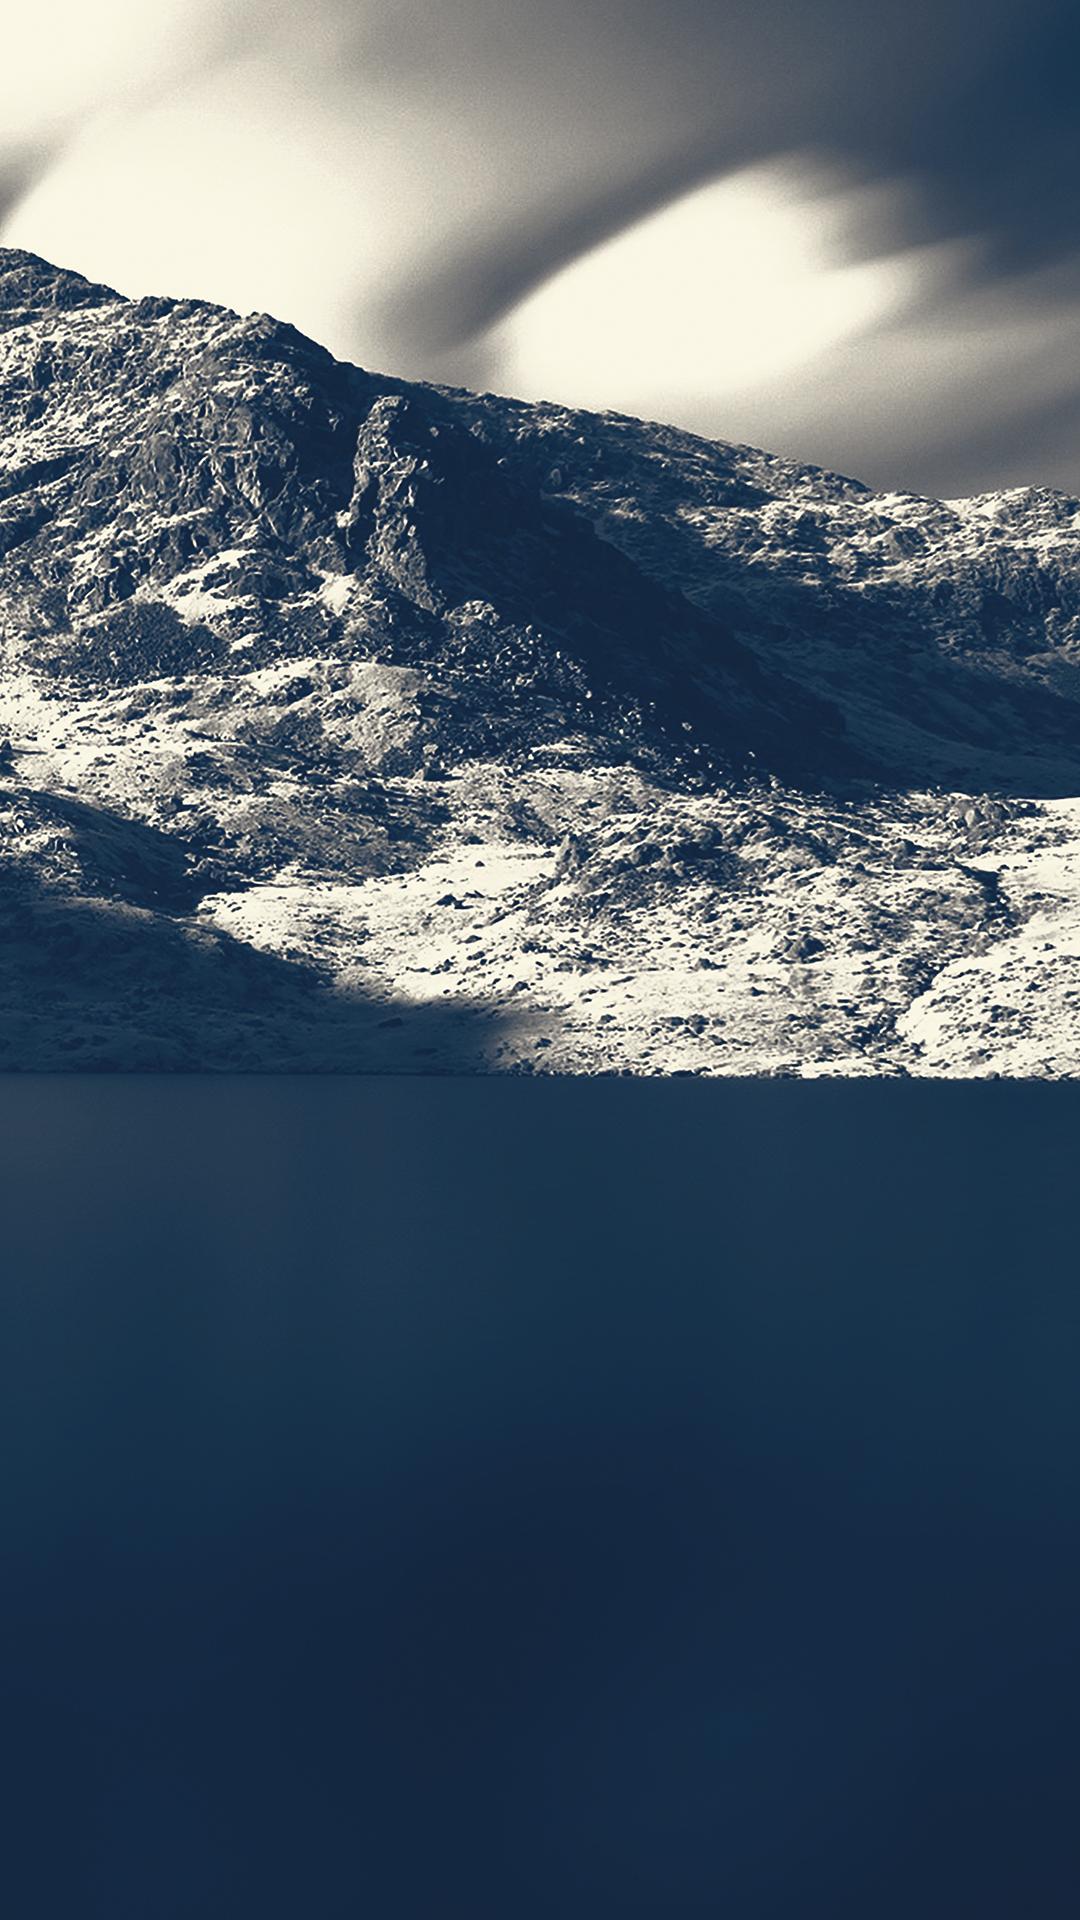 Cool Wallpaper Mountain Phone - blueberry-mountain-6679  Graphic_4857.jpg